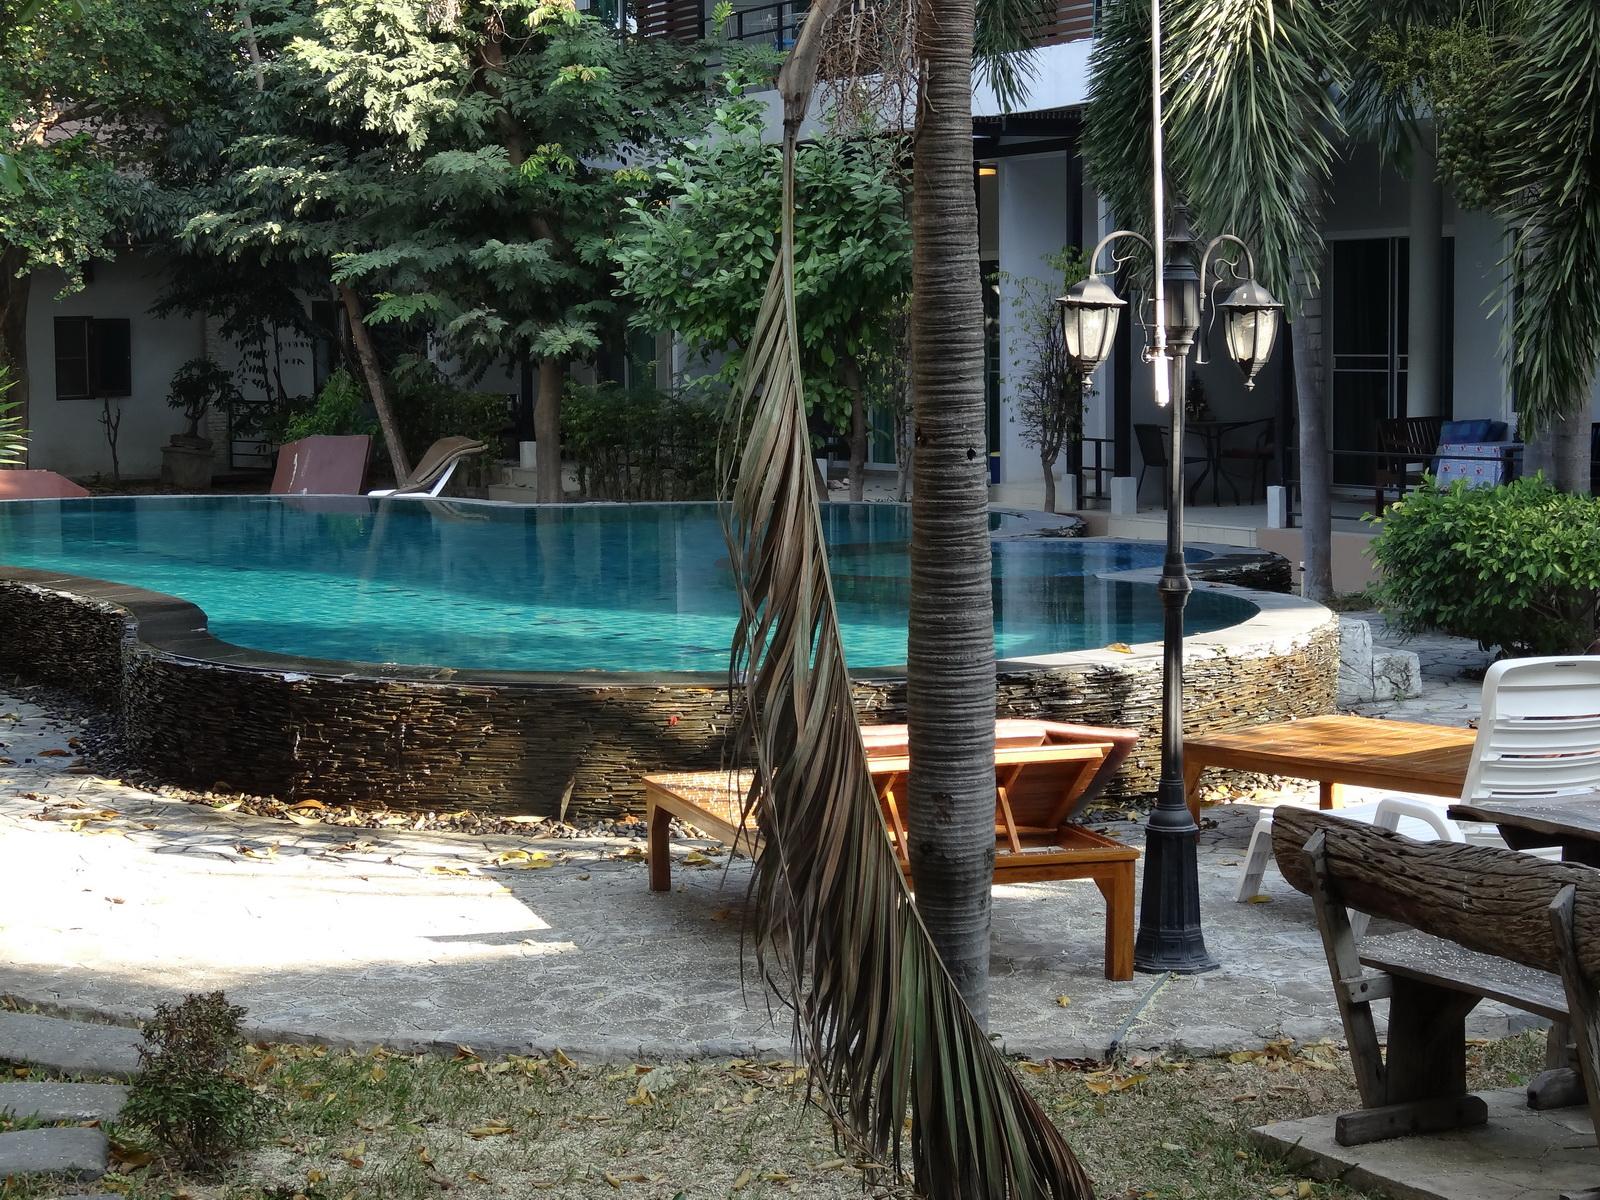 20 Pattaya 364